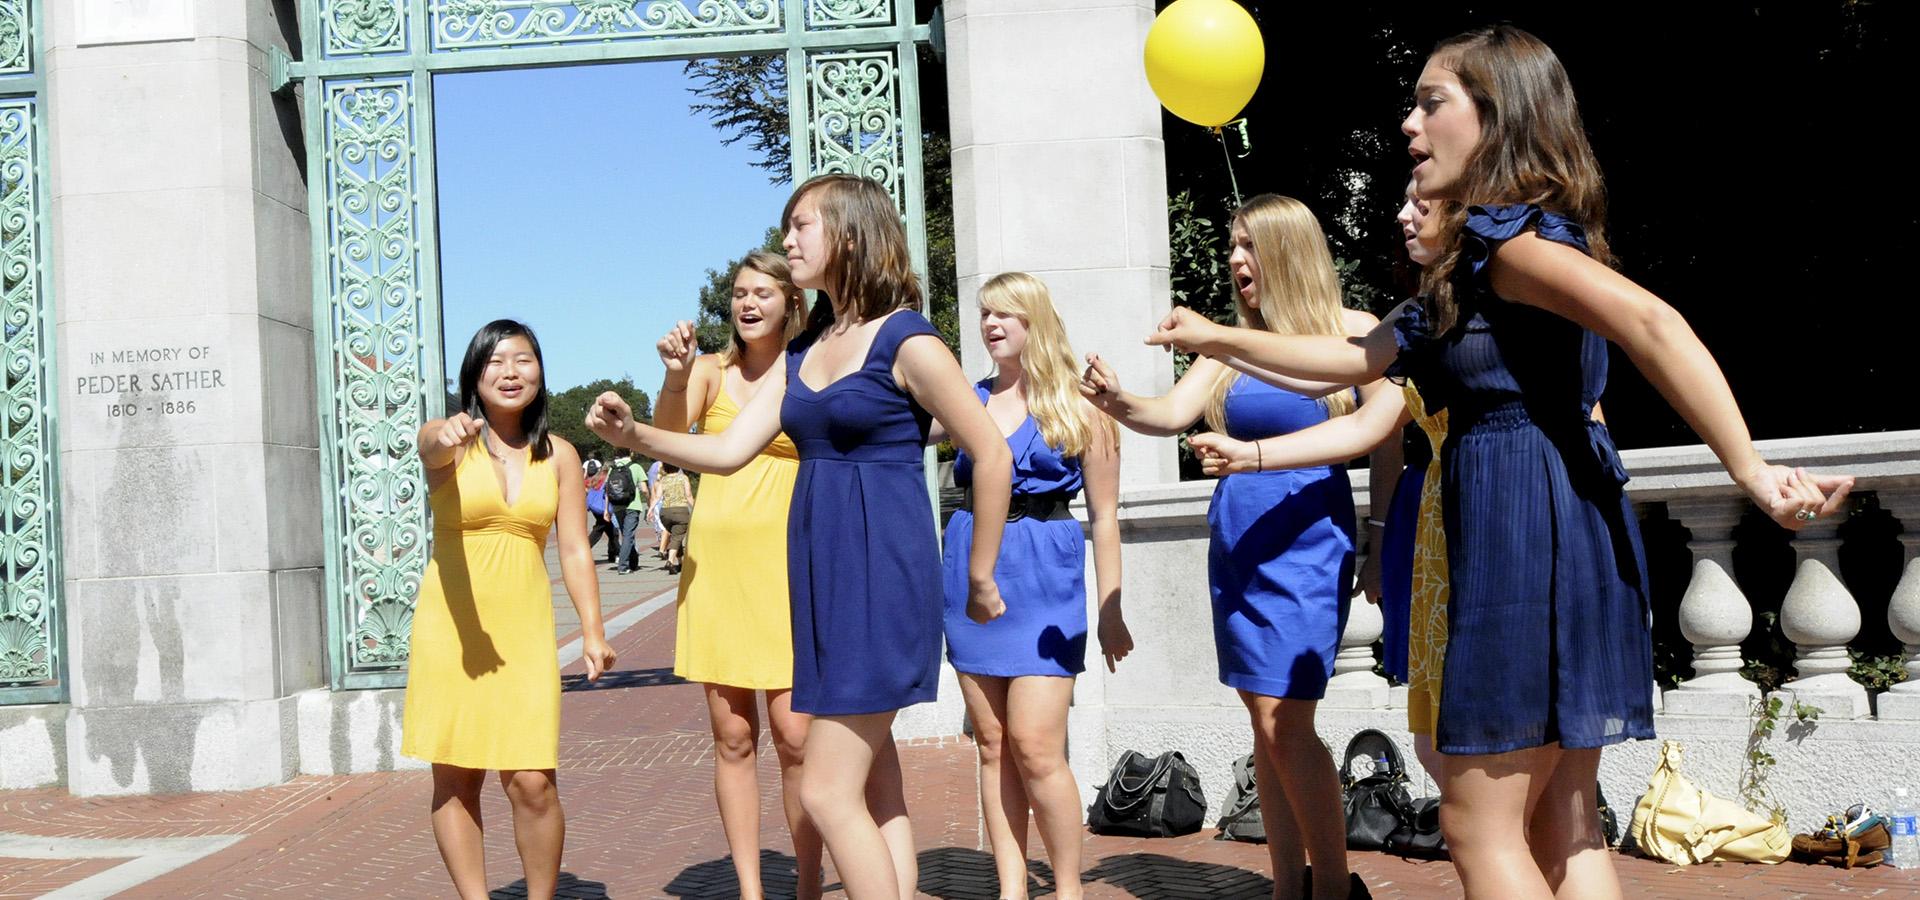 Students in dresses dancing